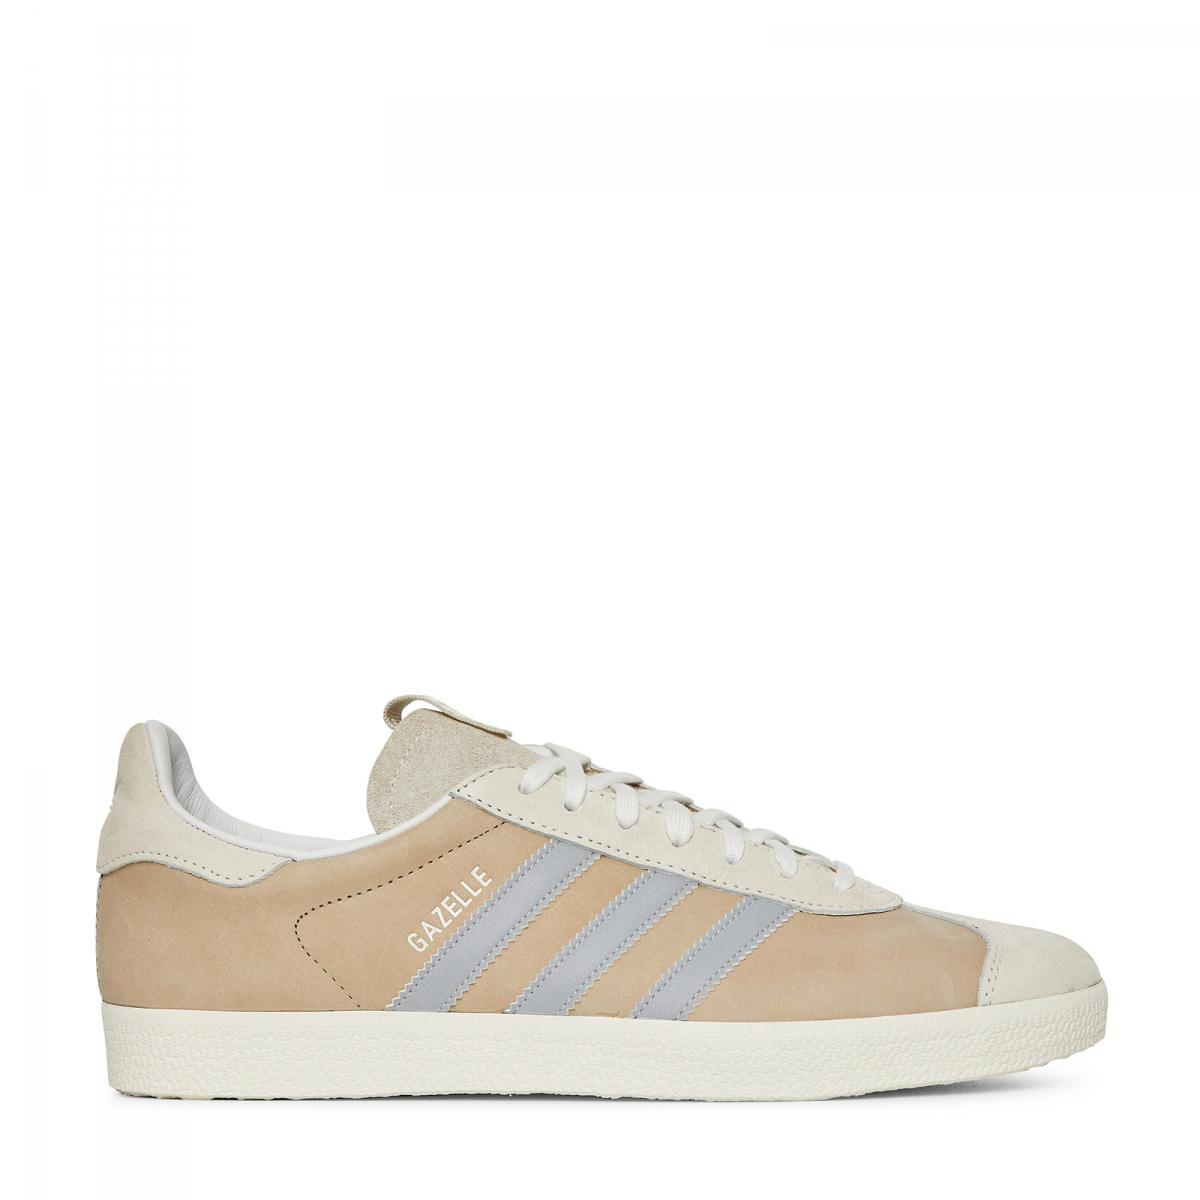 adidas originali gazzella alife x starcow cambio scarpe da ginnastica